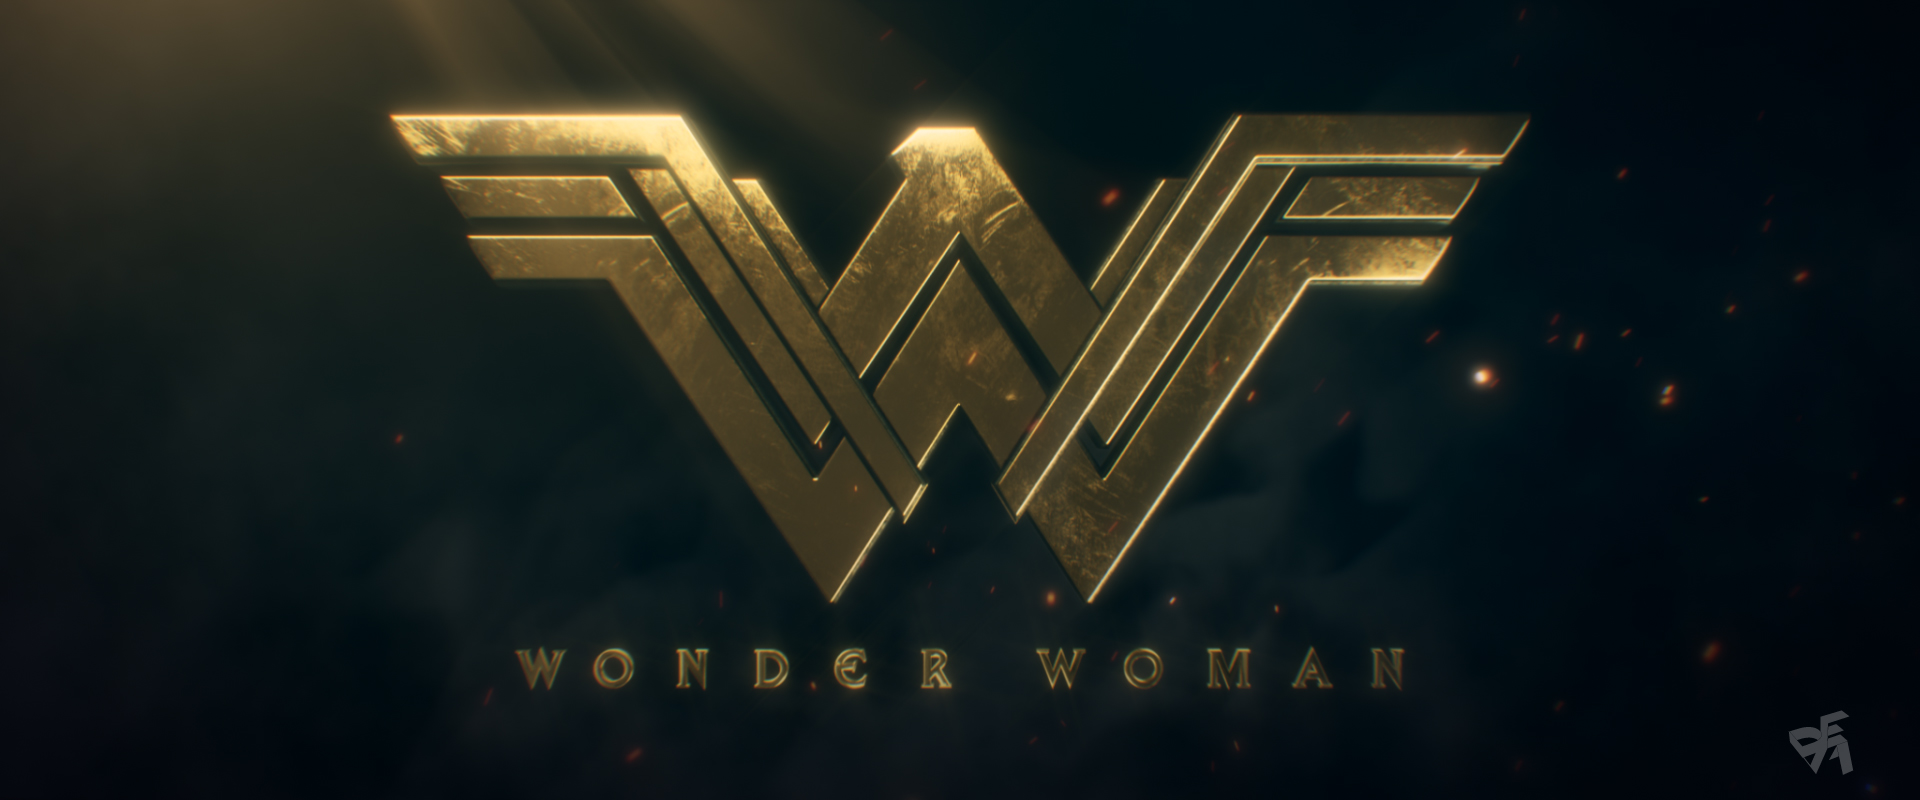 WonderWoman_LOGOCONCEPT_05.jpg